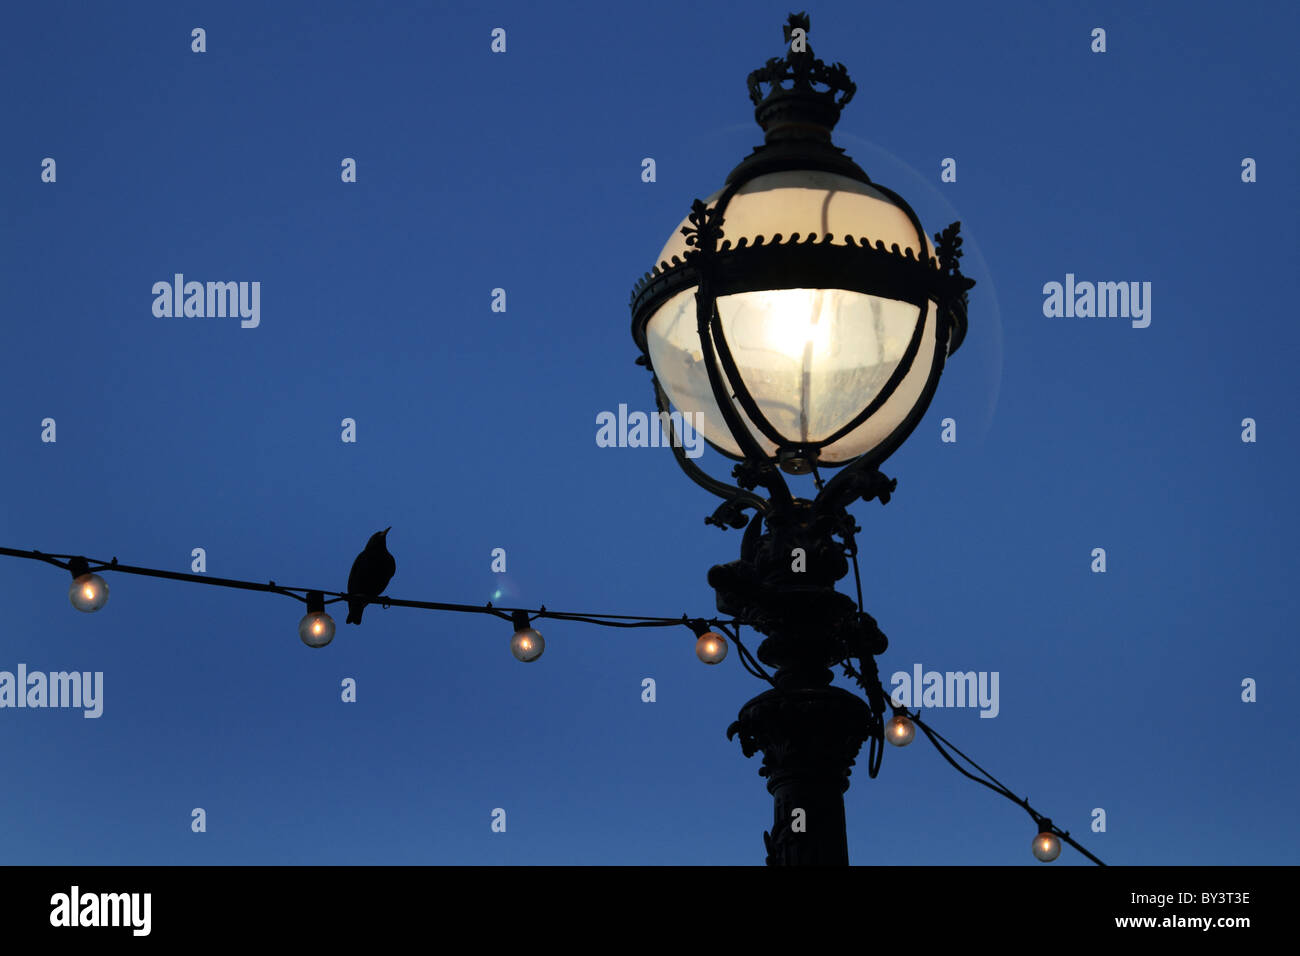 Street light lamp ornamental night bird evening - Stock Image